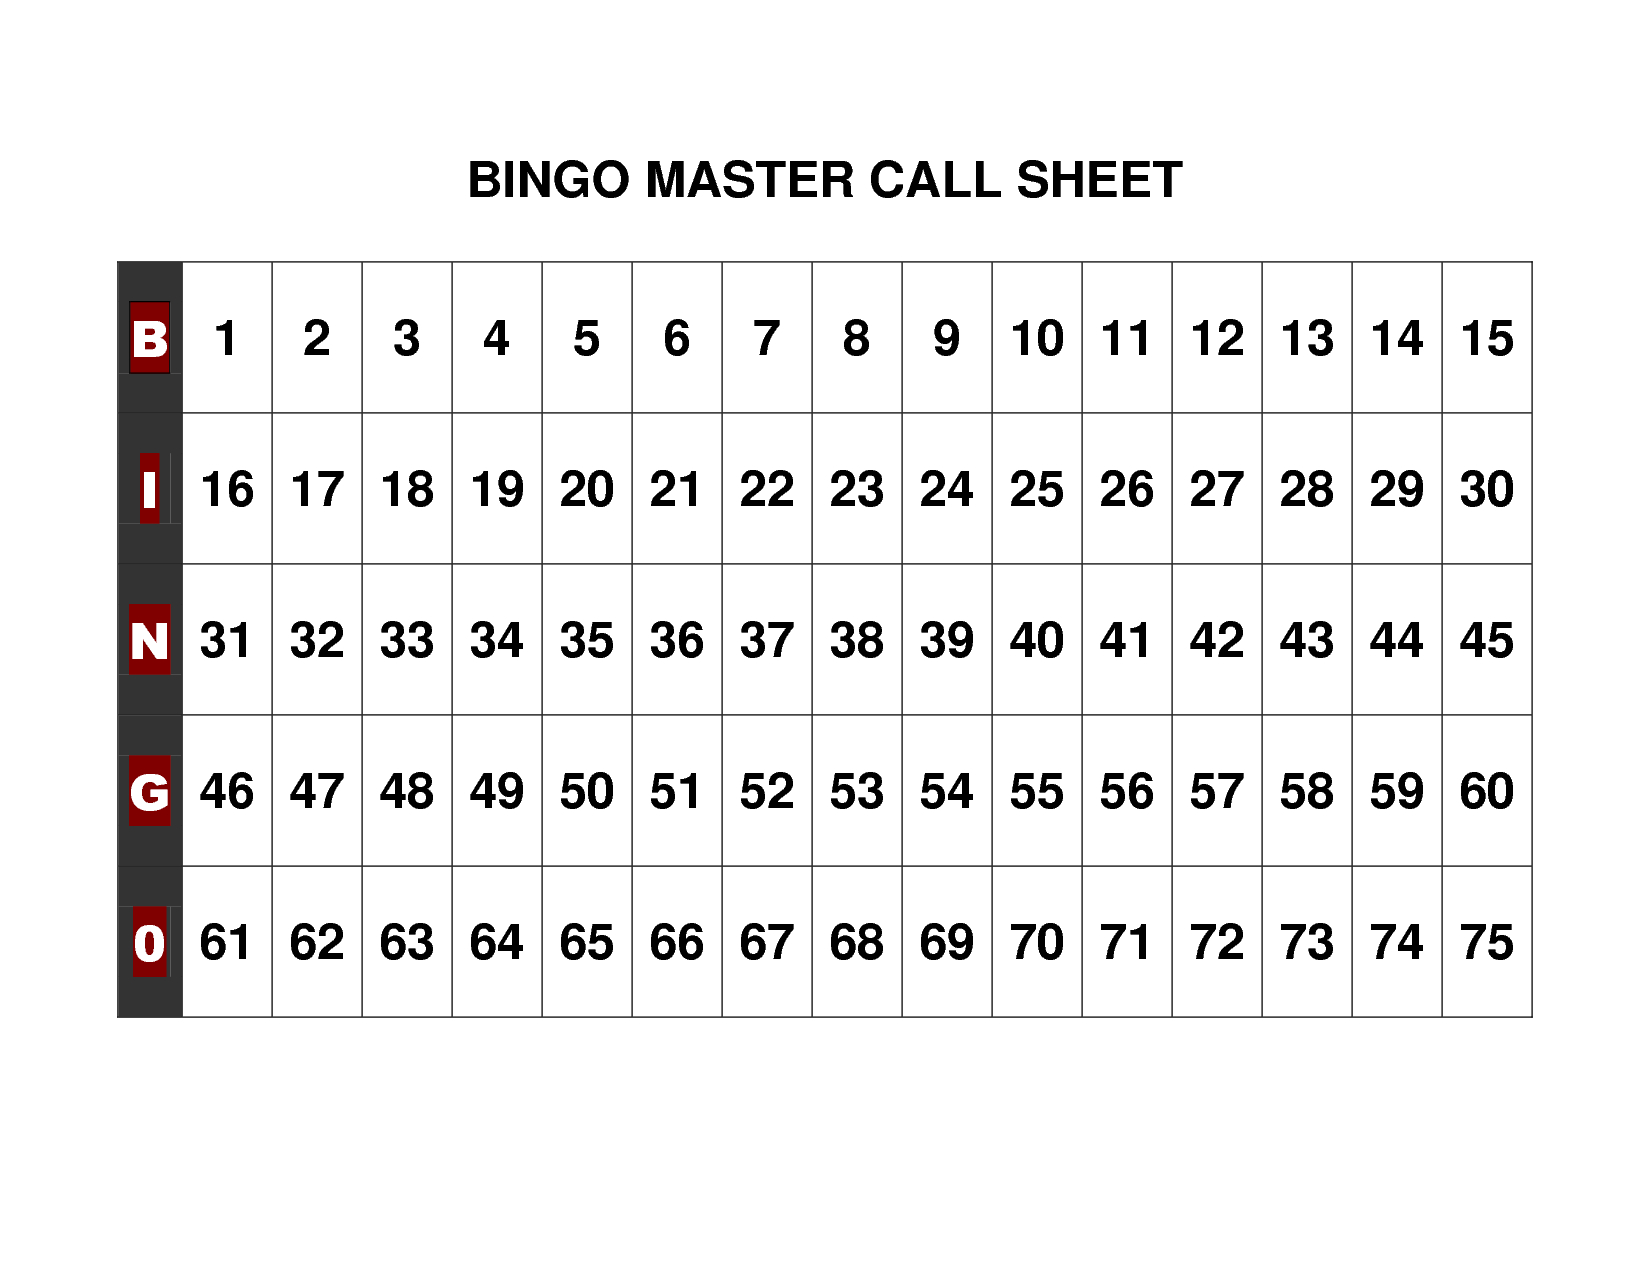 Free+Printable+Bingo+Call+Sheet | Bingo | Pinterest | Bingo Calls - Free Printable Bingo Cards And Call Sheet